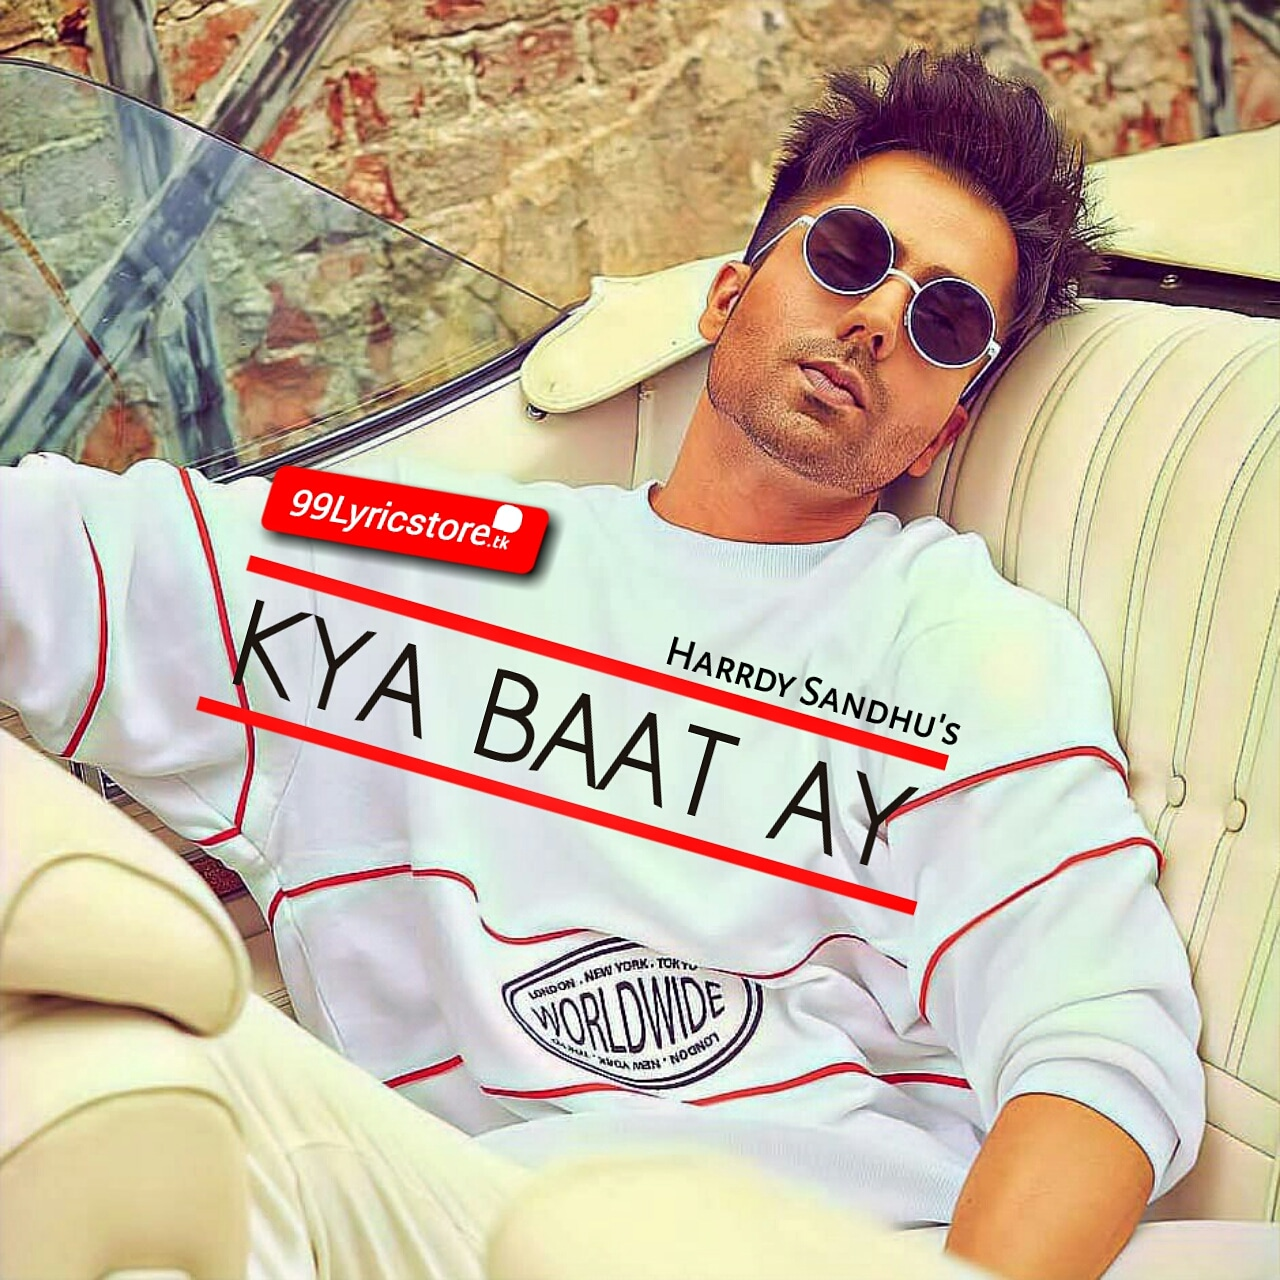 Kya Baat Ay Lyrics Sung by Harrdy Sandhu